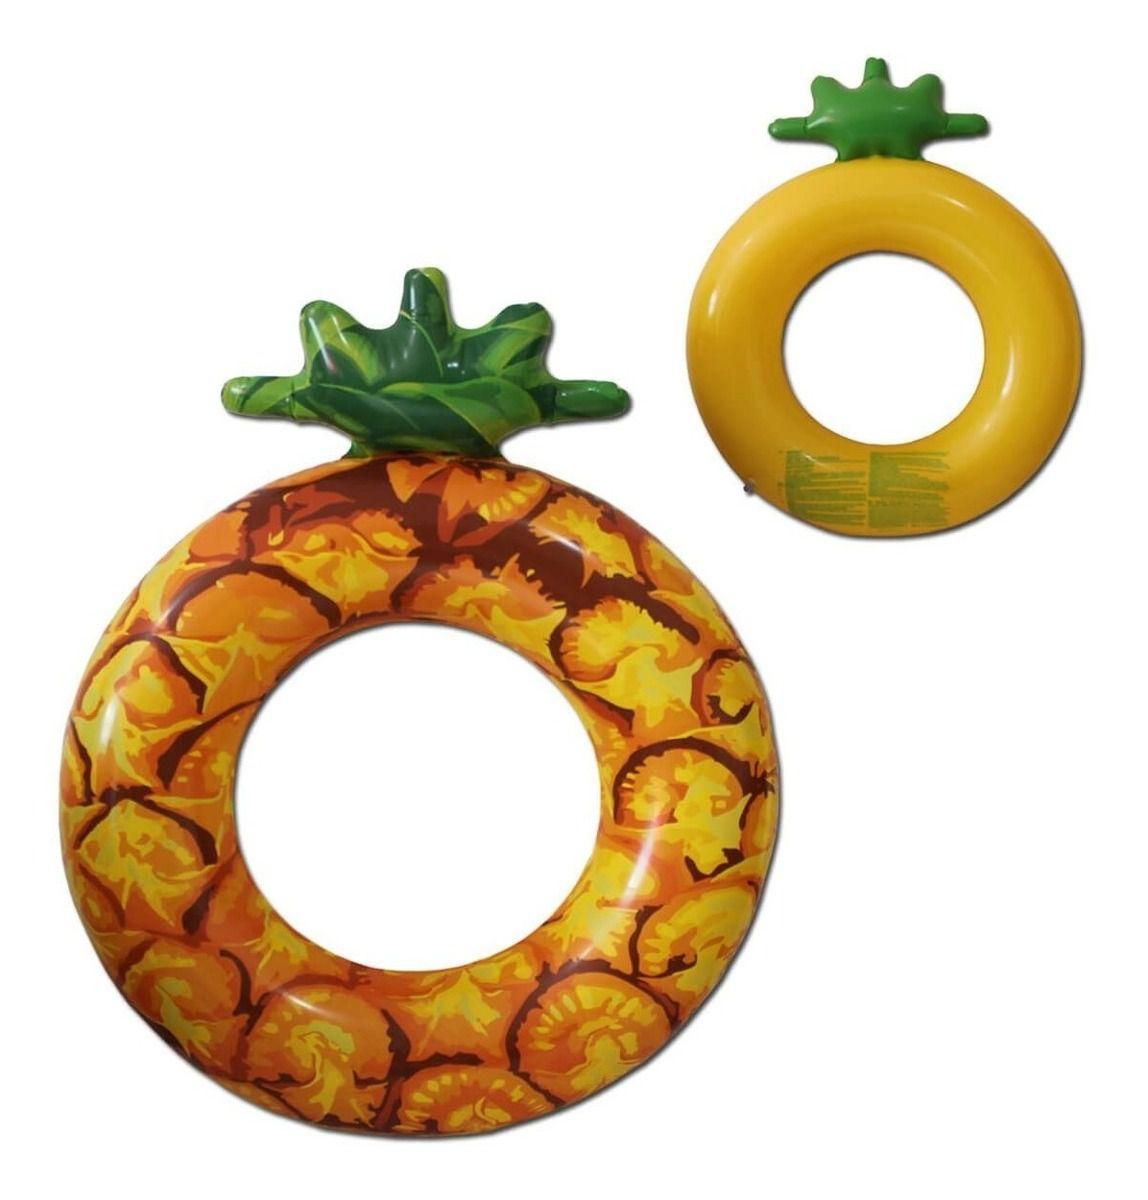 Boia Inflável Circular Frutas Diversas Bestway